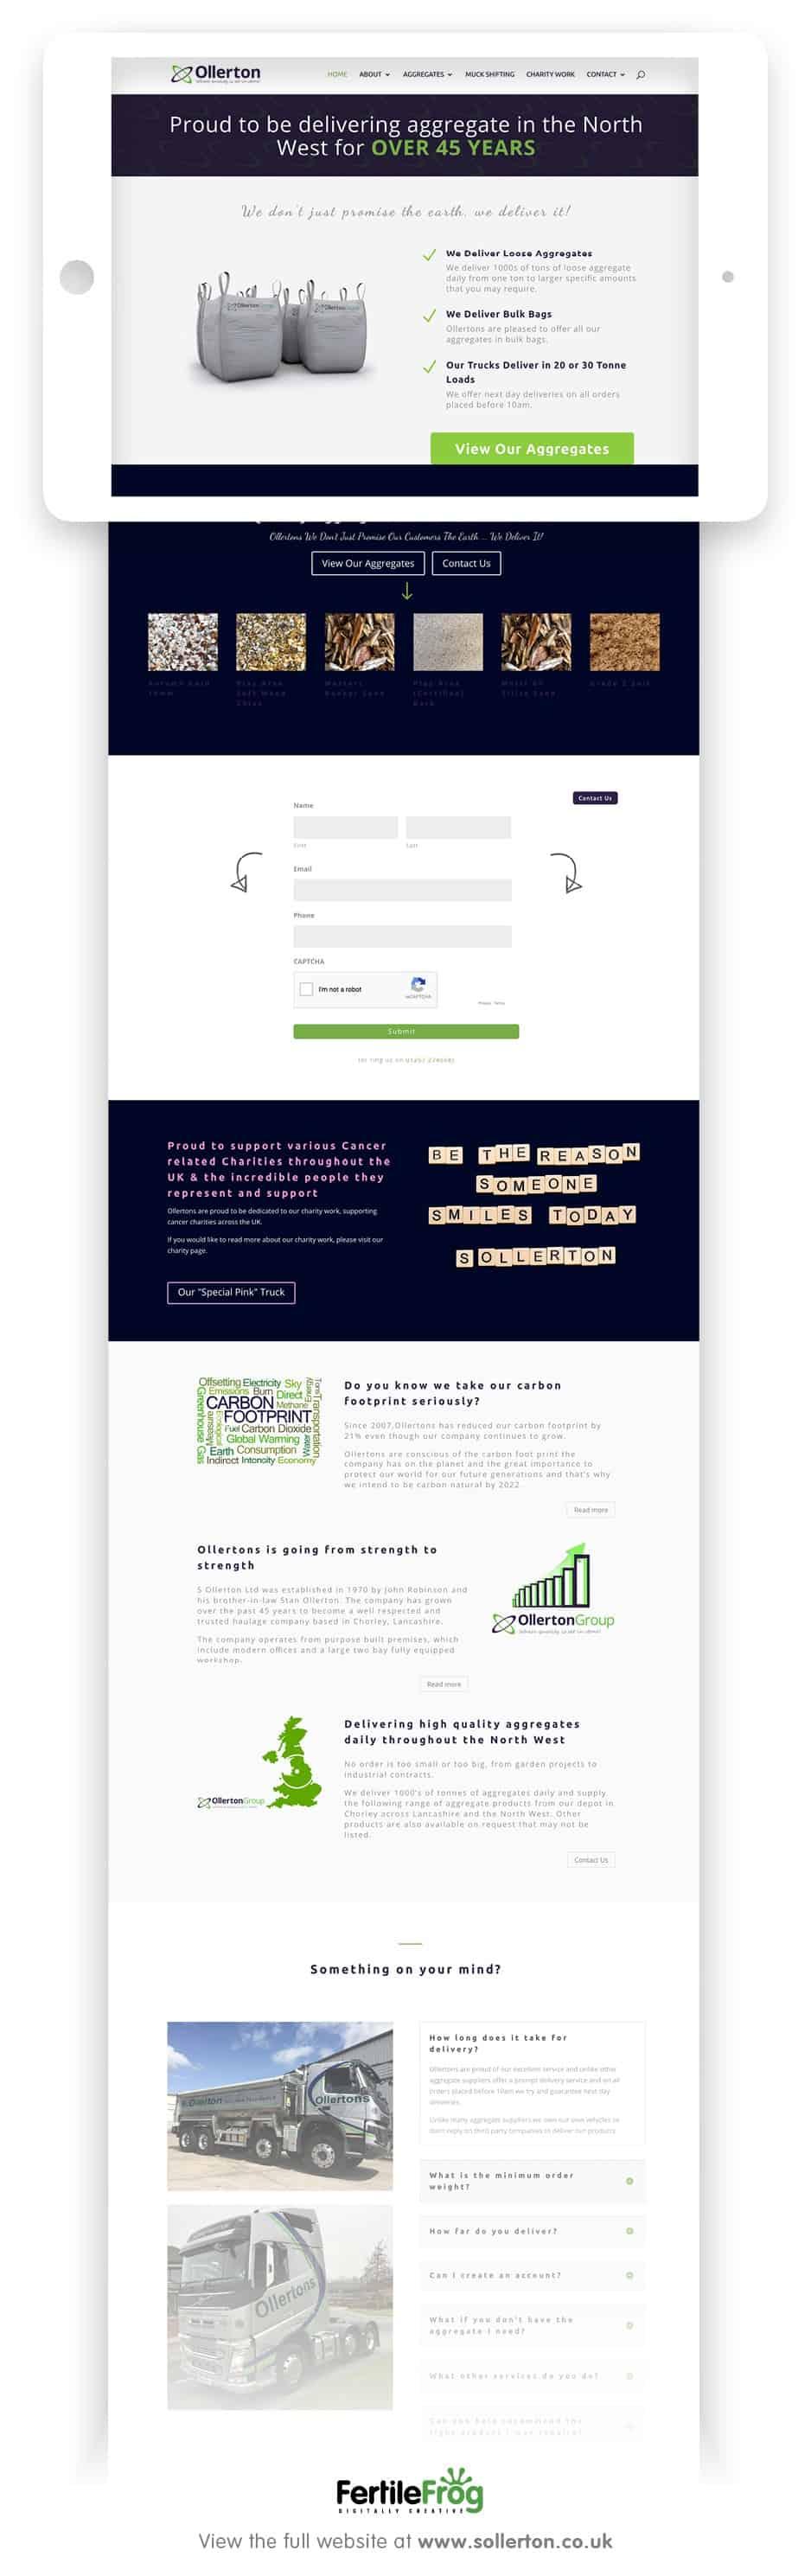 S Ollerton website home page designed by fertile frog